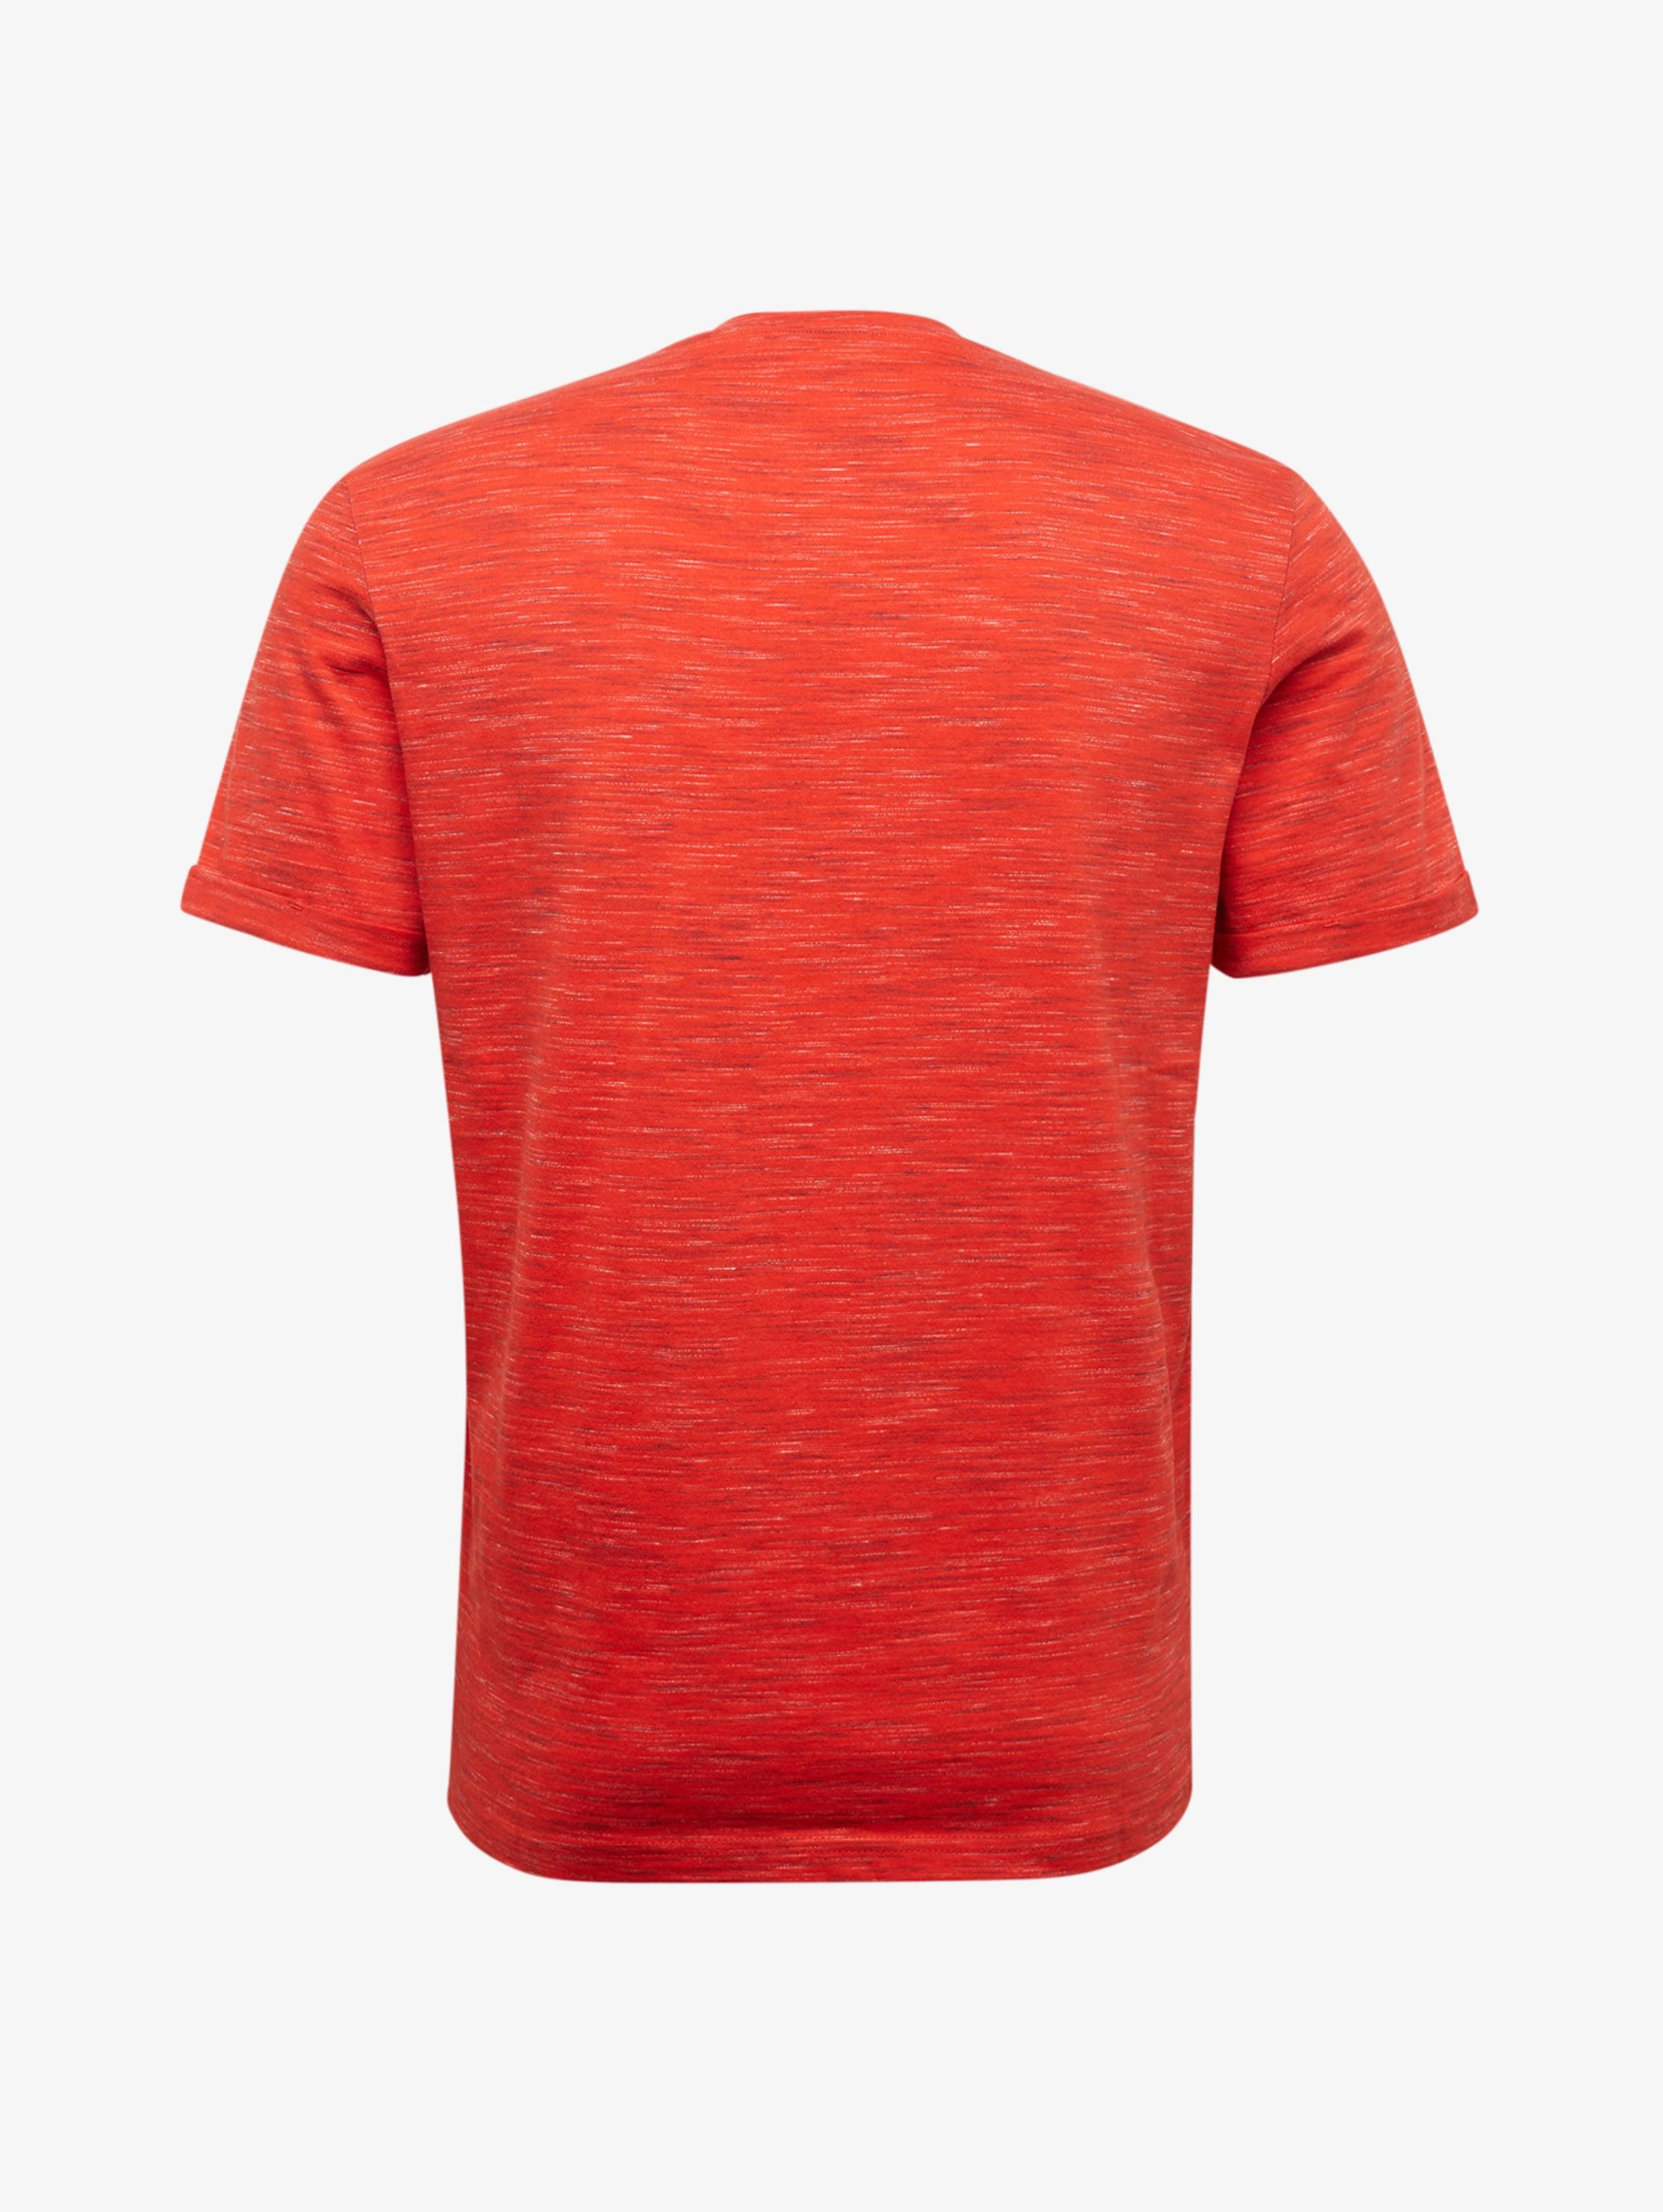 Rotmeliert shirt In T Tailor Tom vNmw80n